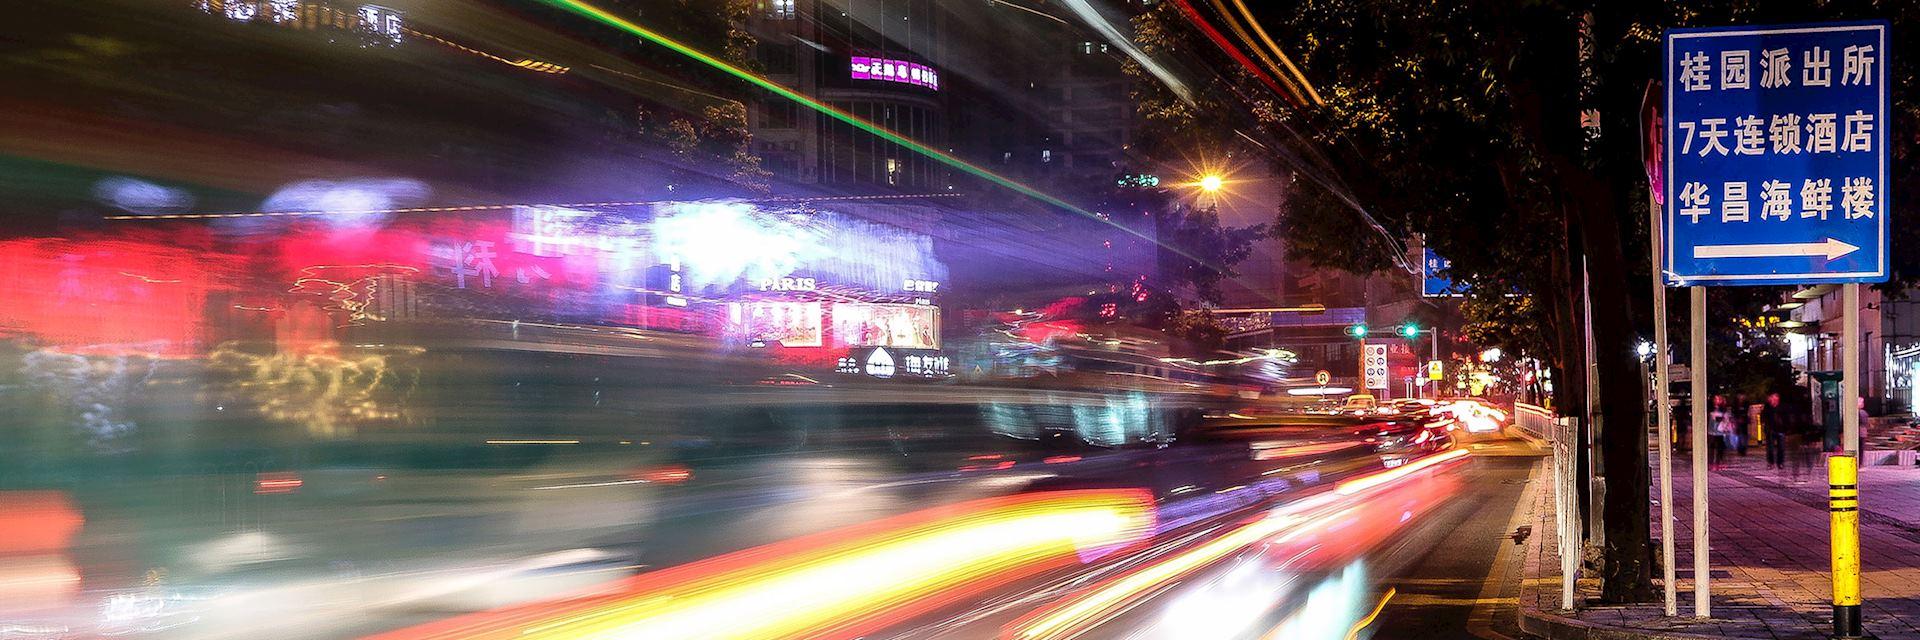 Shenzhen at night, China